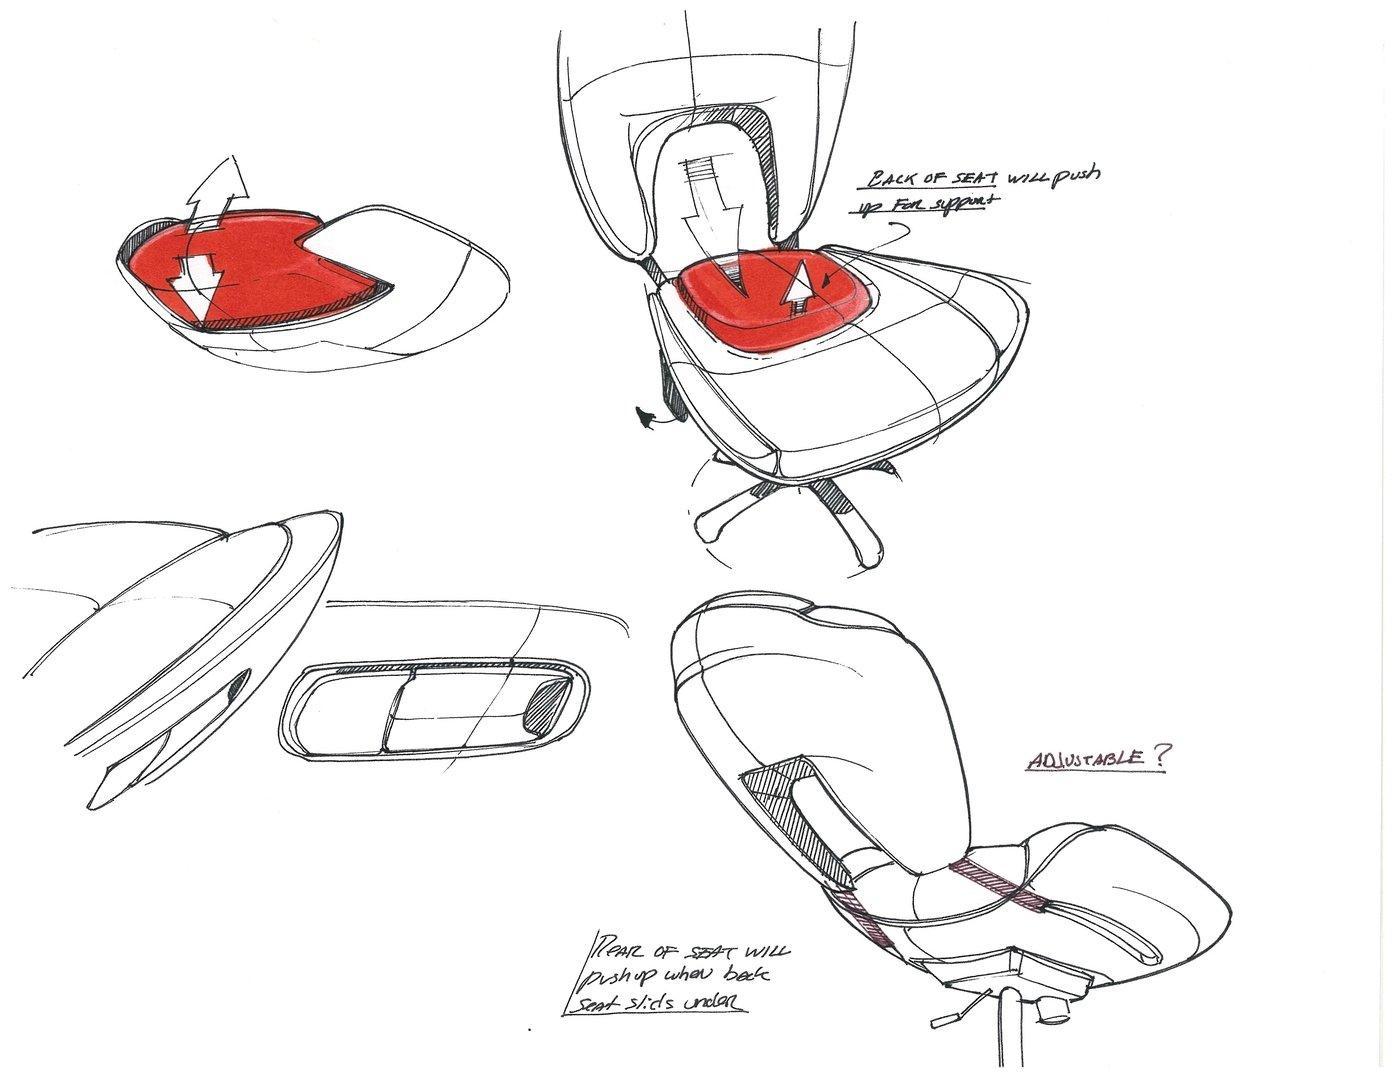 Chair design concept Sketches by Jon Osborne IDSA at